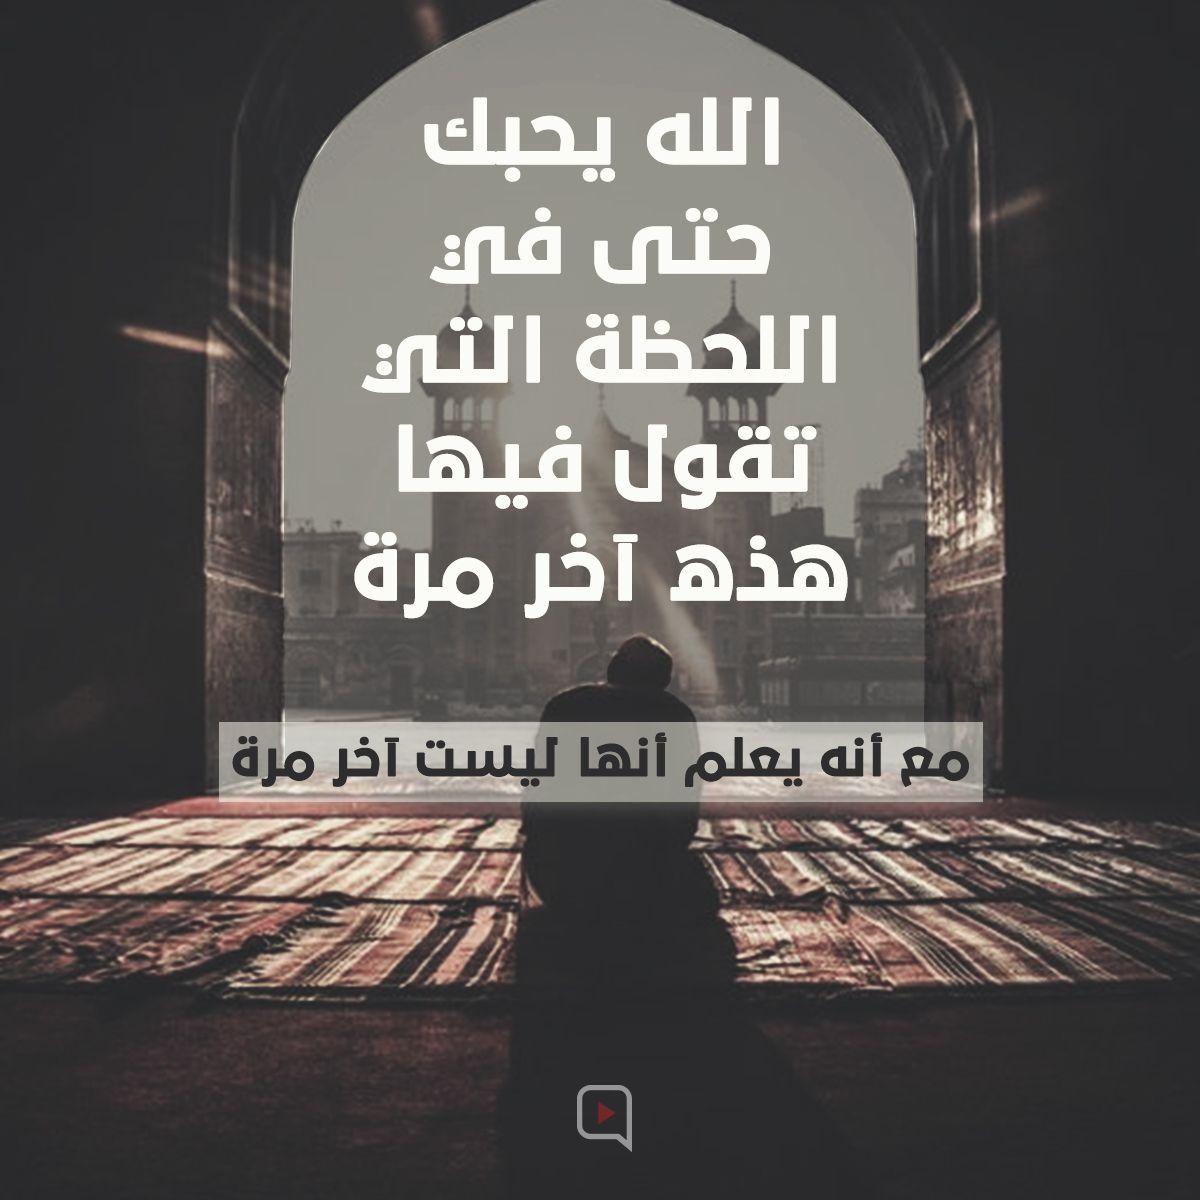 الله يحبك تصاميم إسلامية Islamic Designs Movie Posters Photography Poster